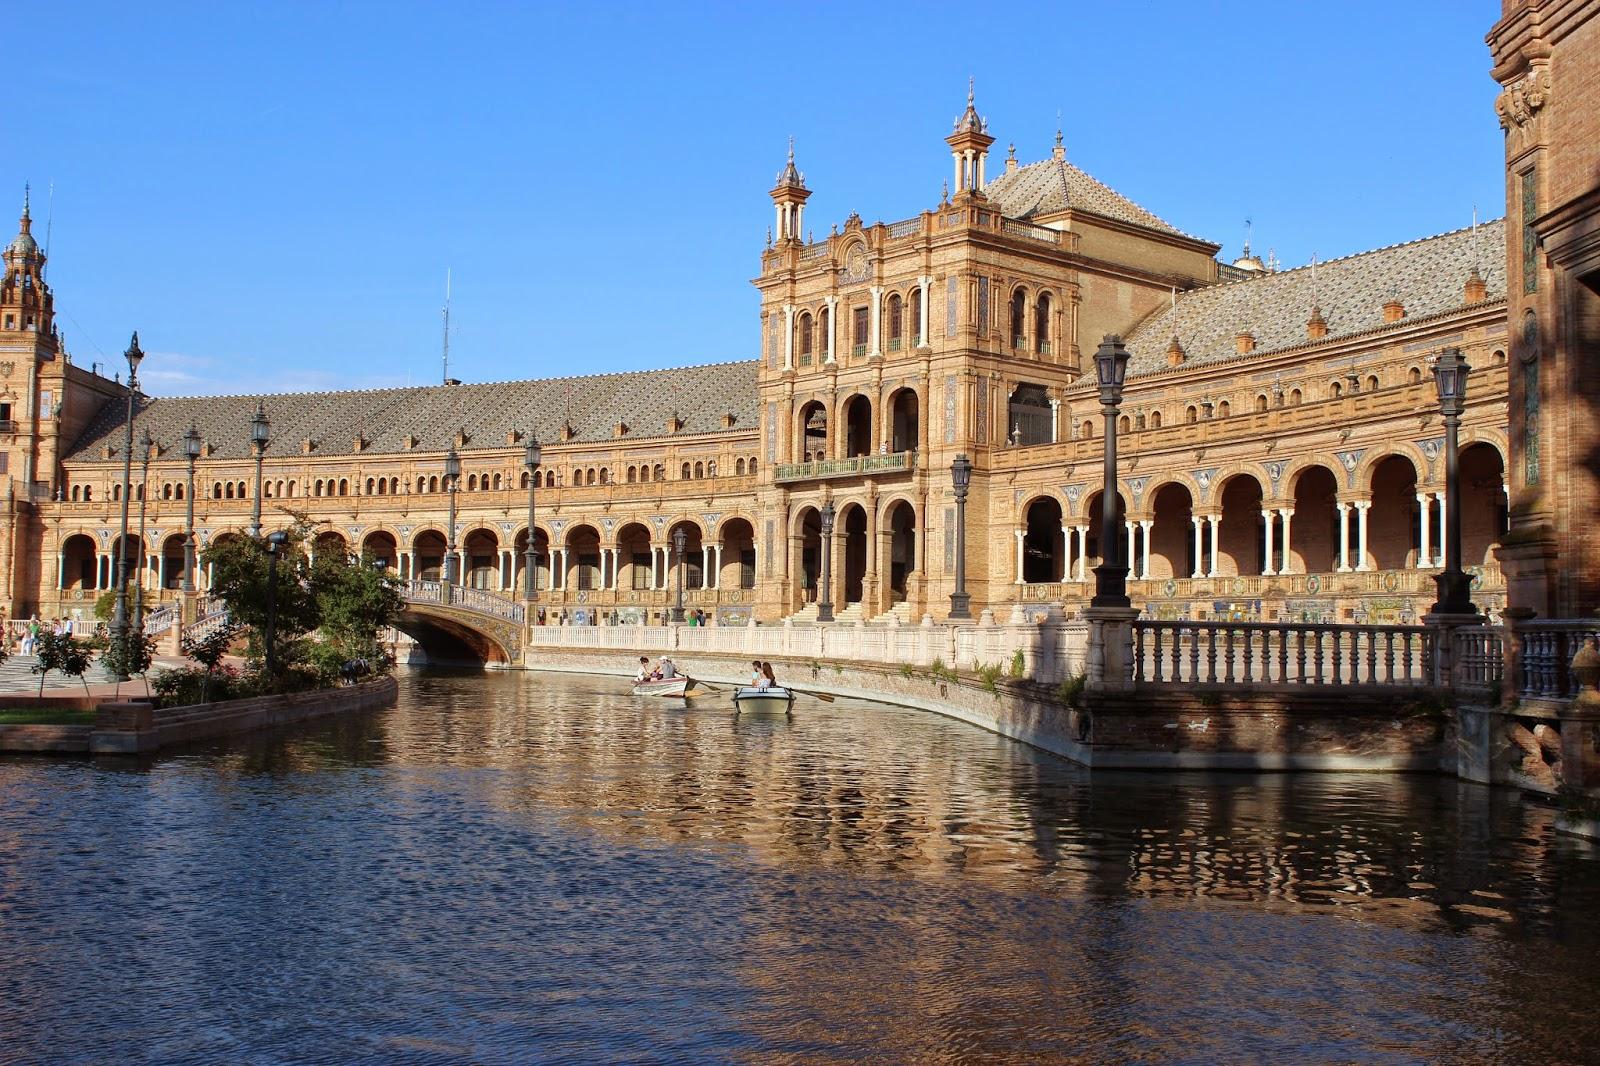 La plaza de espagna seville